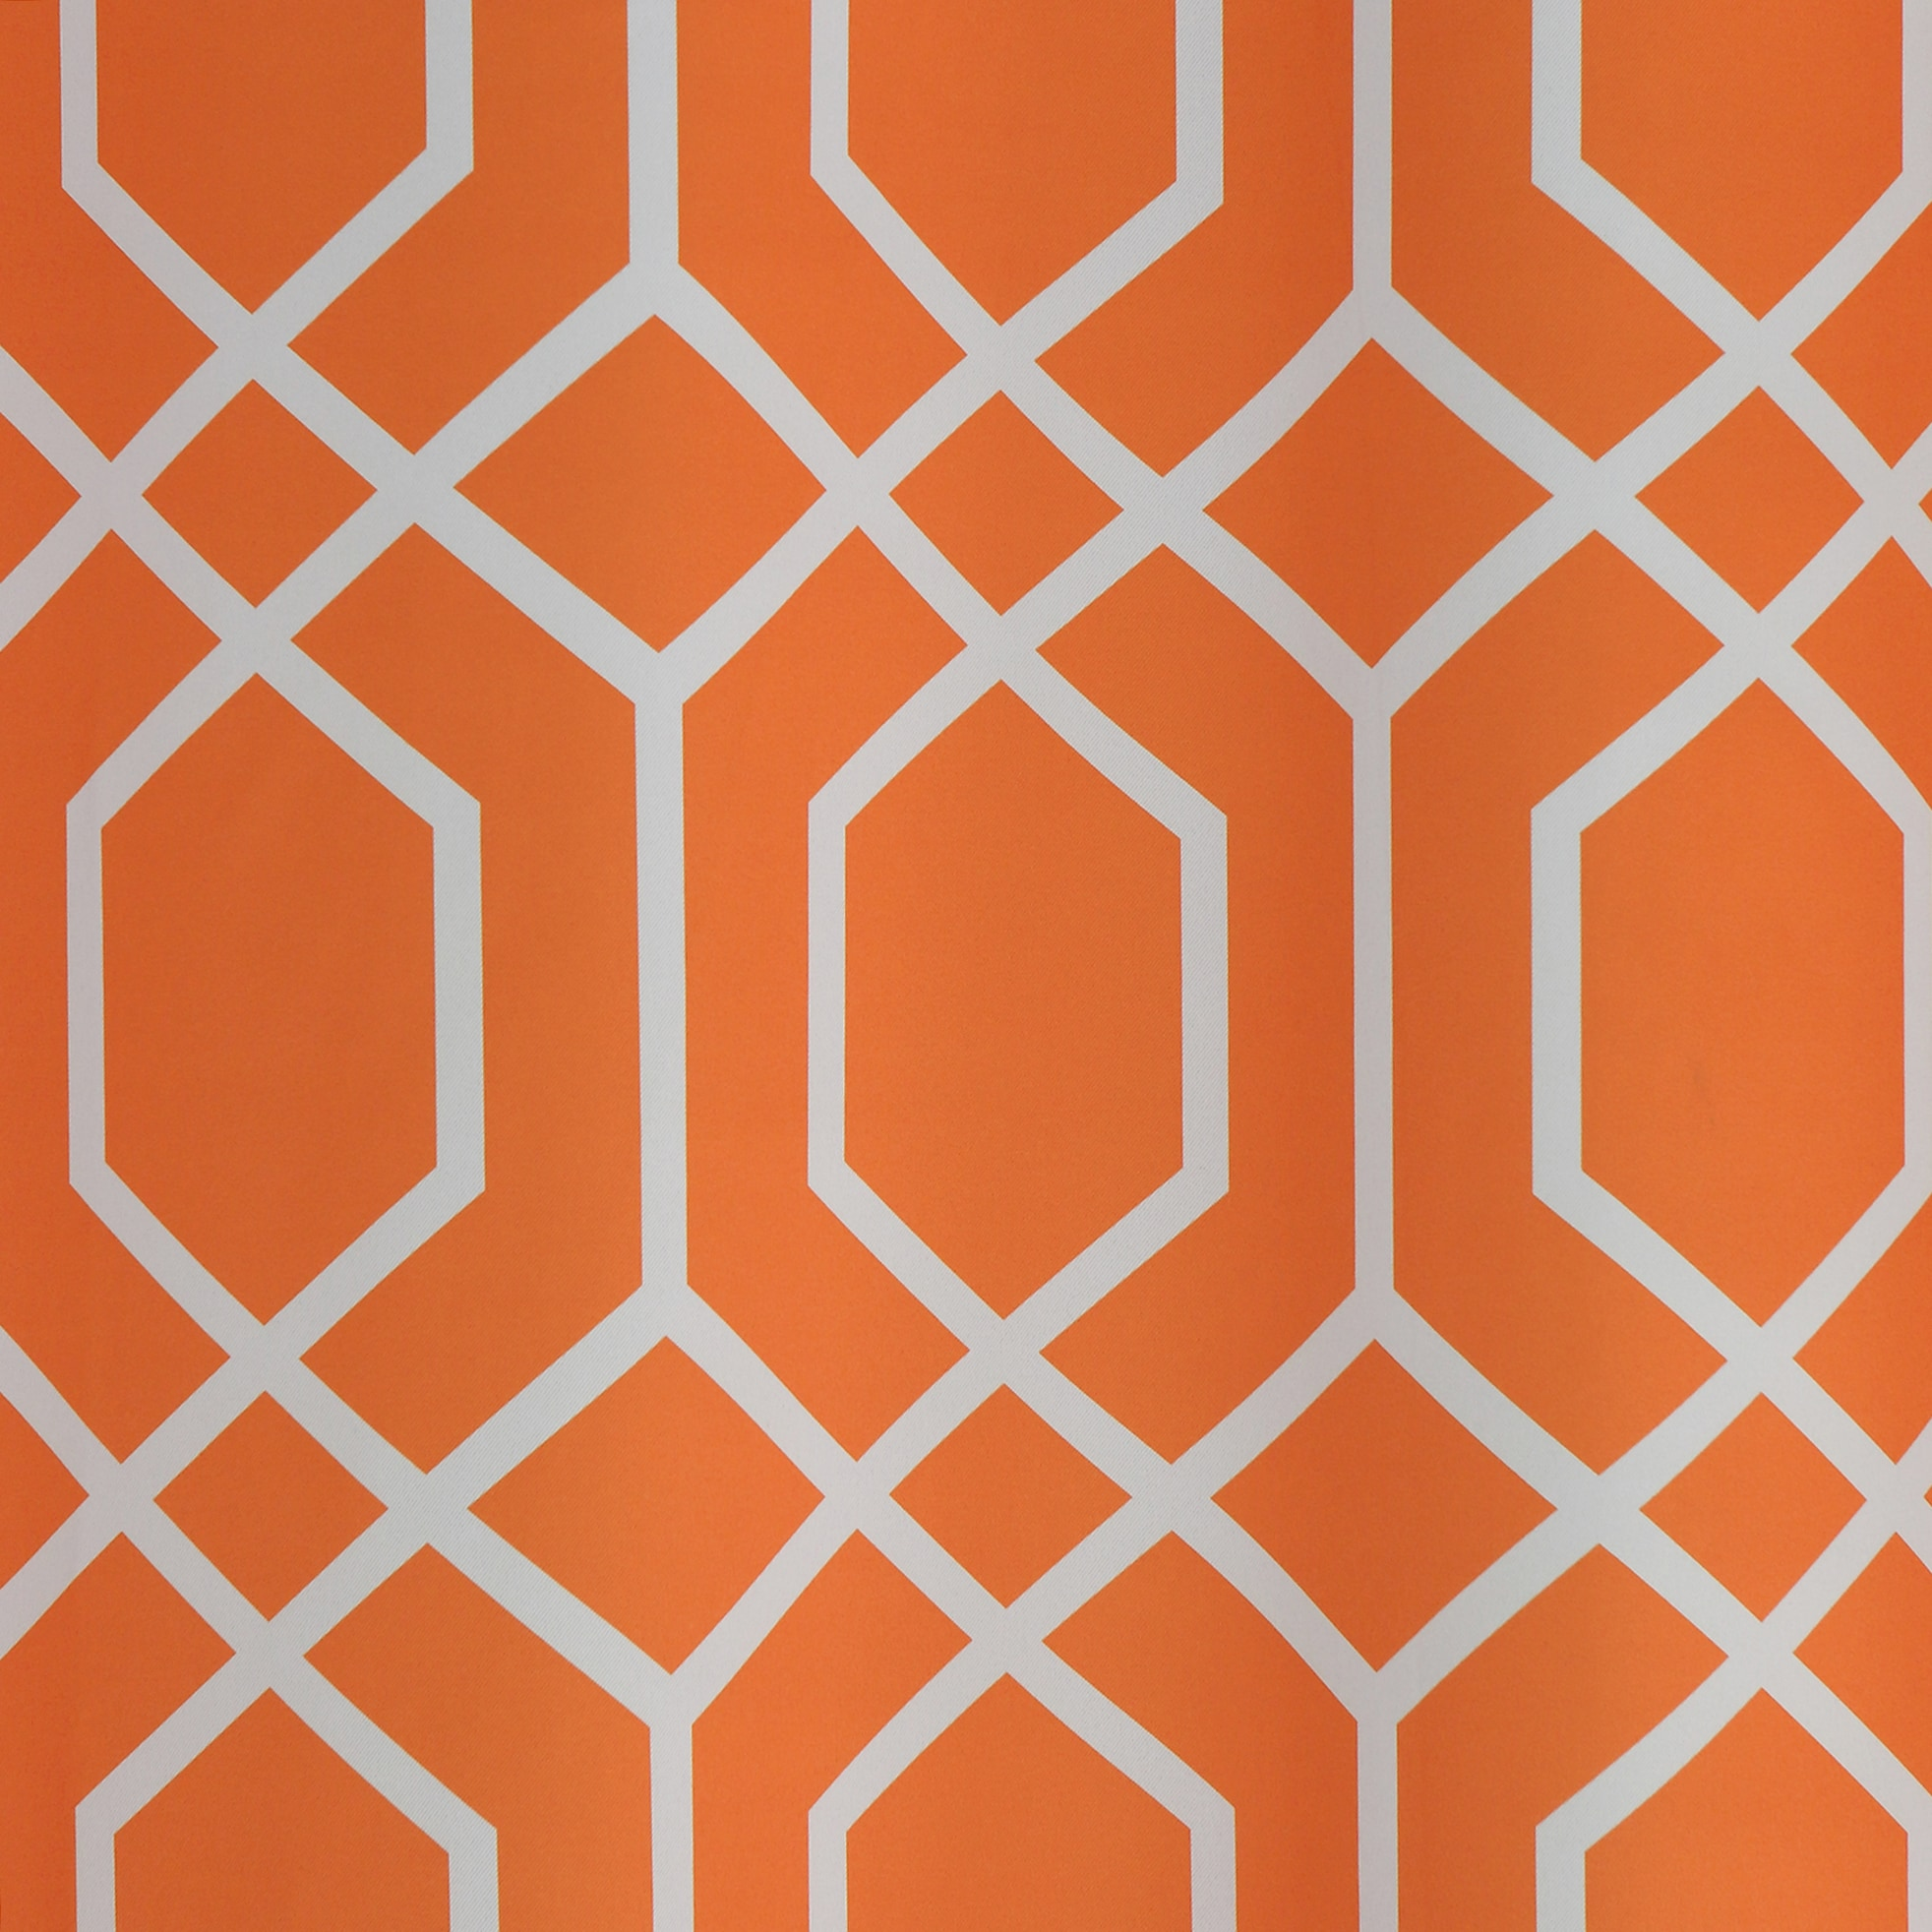 Lights Out Geometric Trellis Printed Room Darkening Curtain Panel Pair